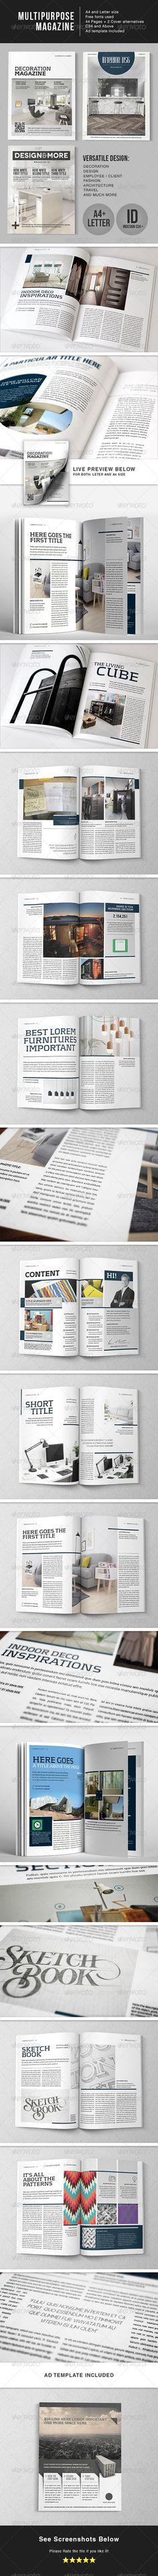 Multipurpose 44 Page Magazine Template Letter Magazines Print Templates